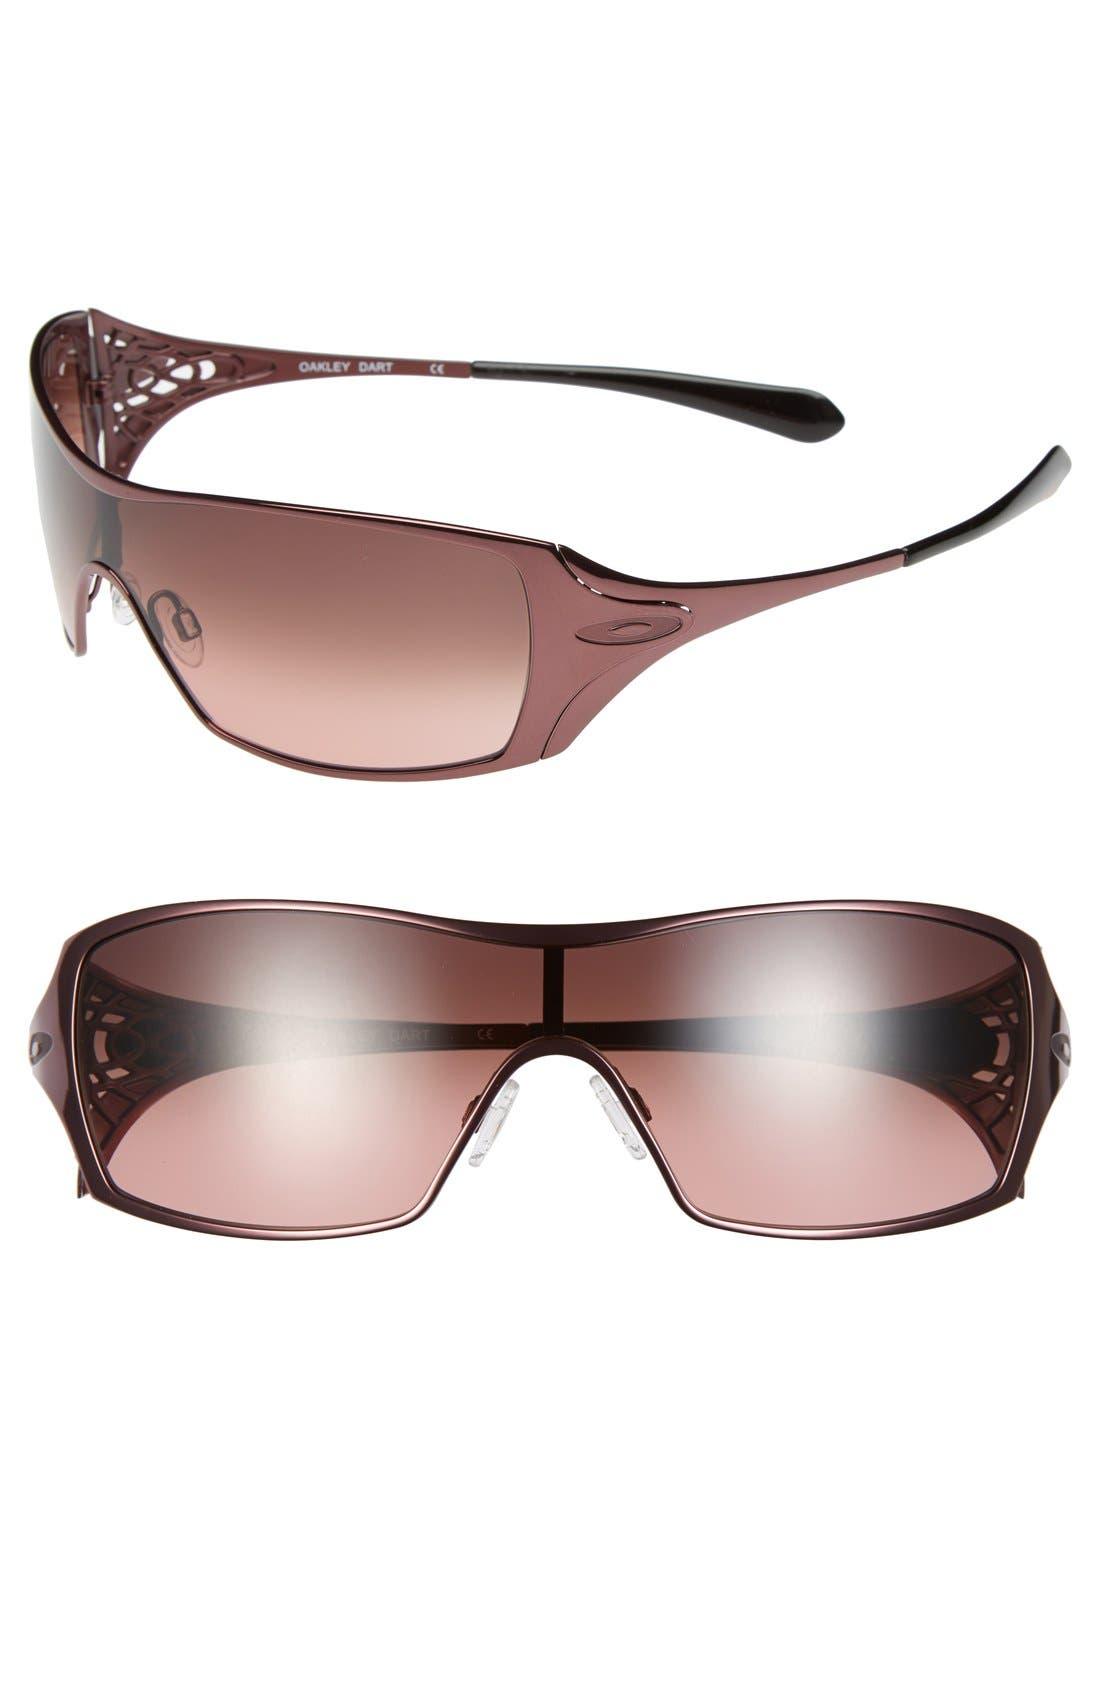 Alternate Image 1 Selected - Oakley 'Dart' Shield Sunglasses